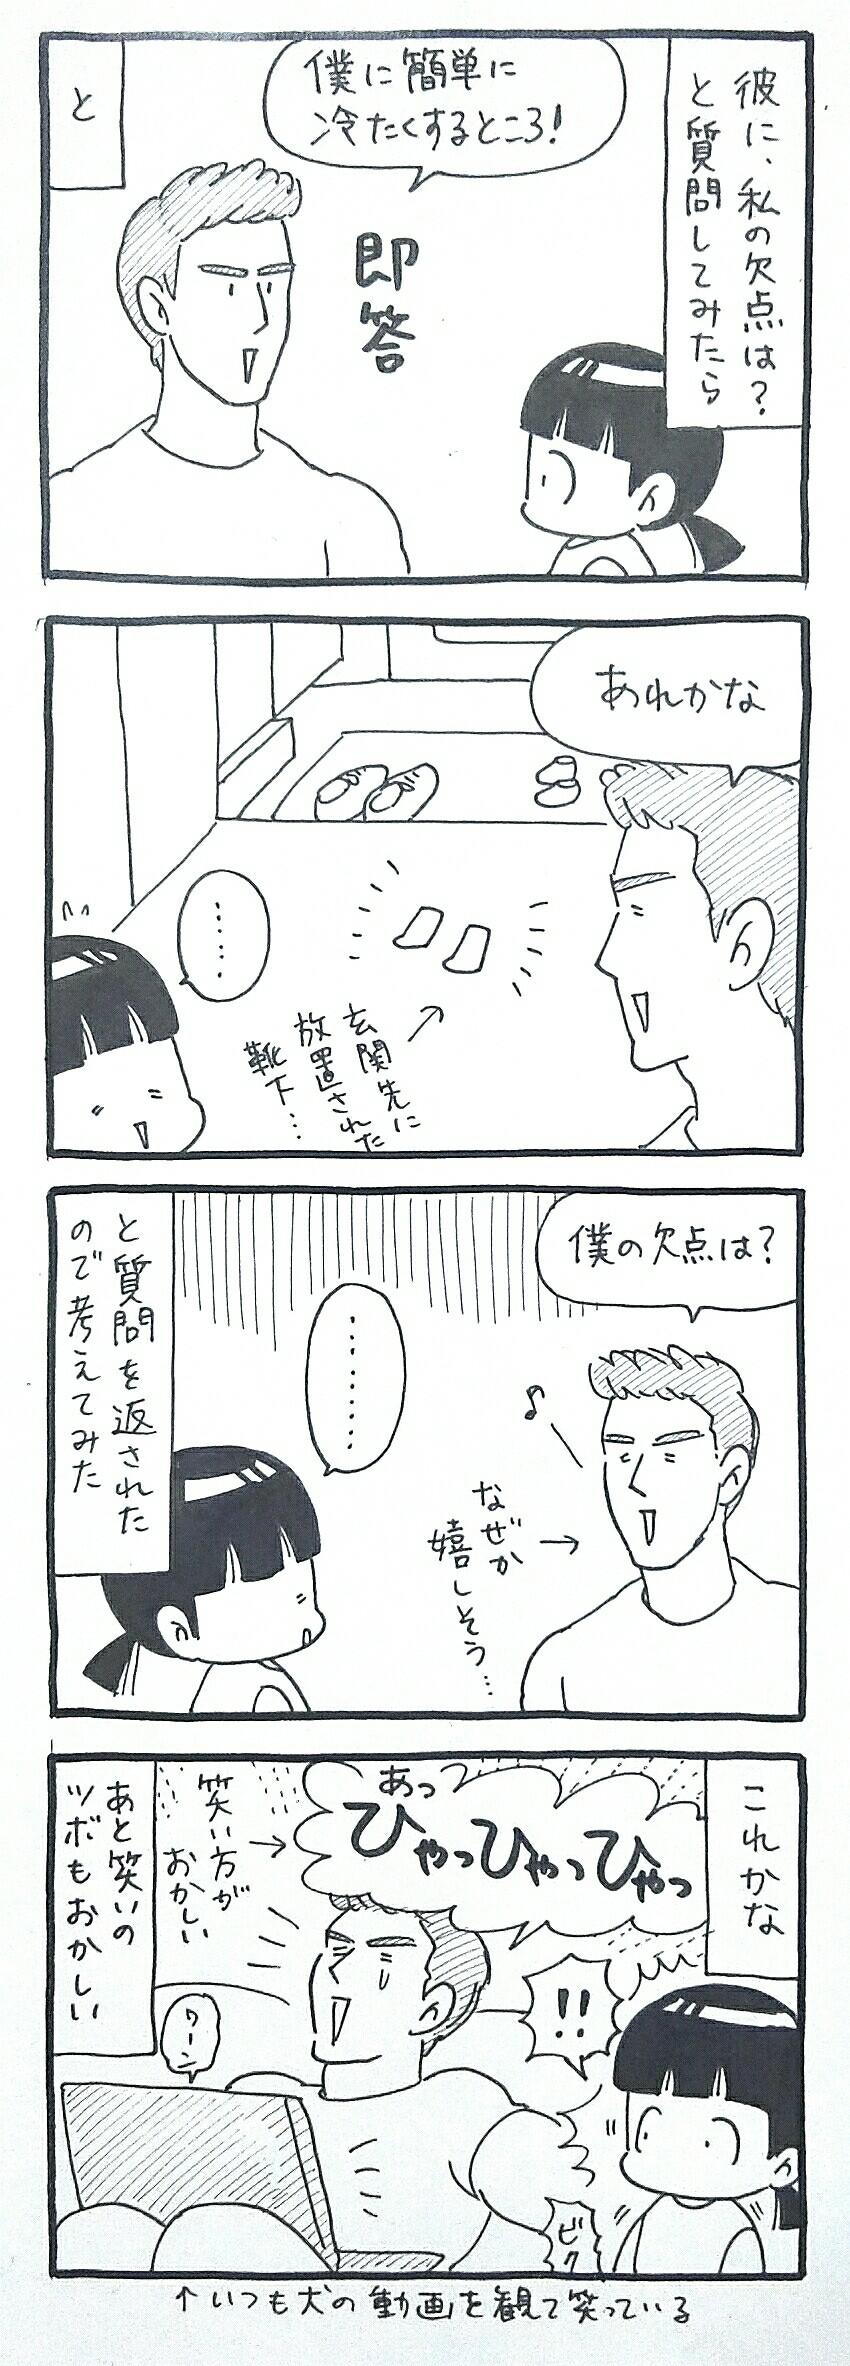 f:id:Shoko_drawing:20190613223424j:plain